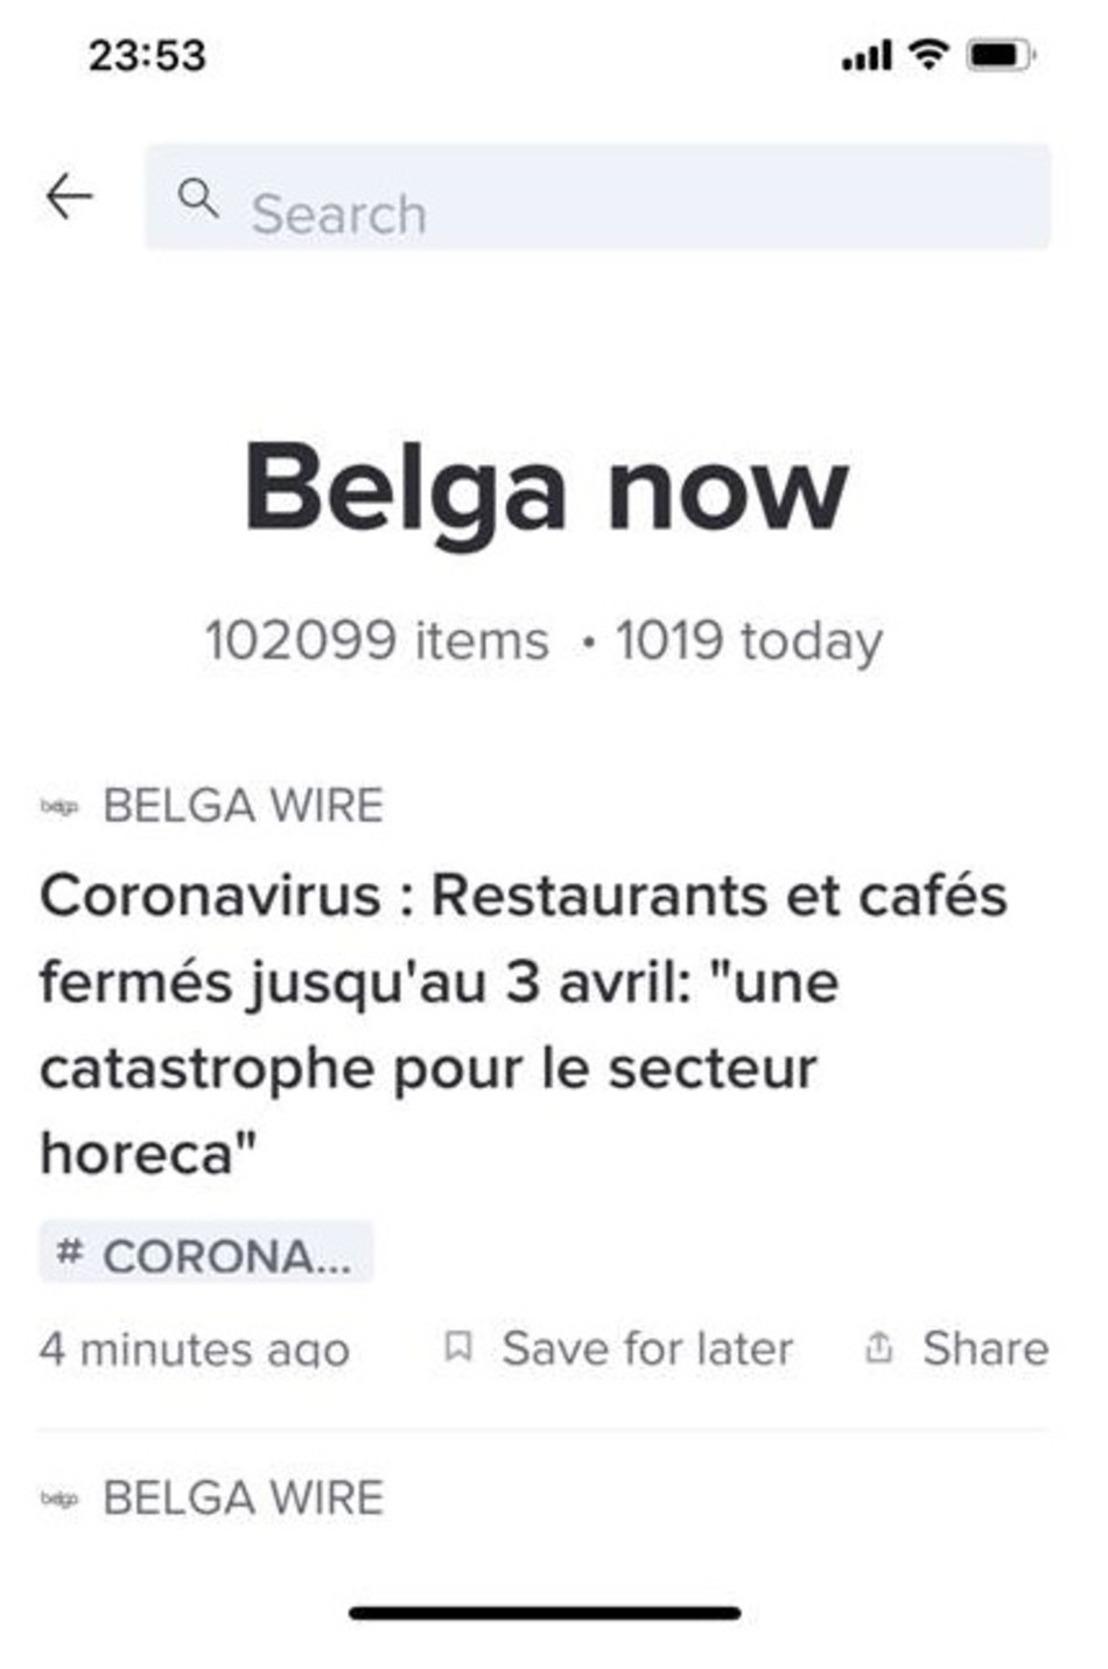 Belga et le Coronavirus